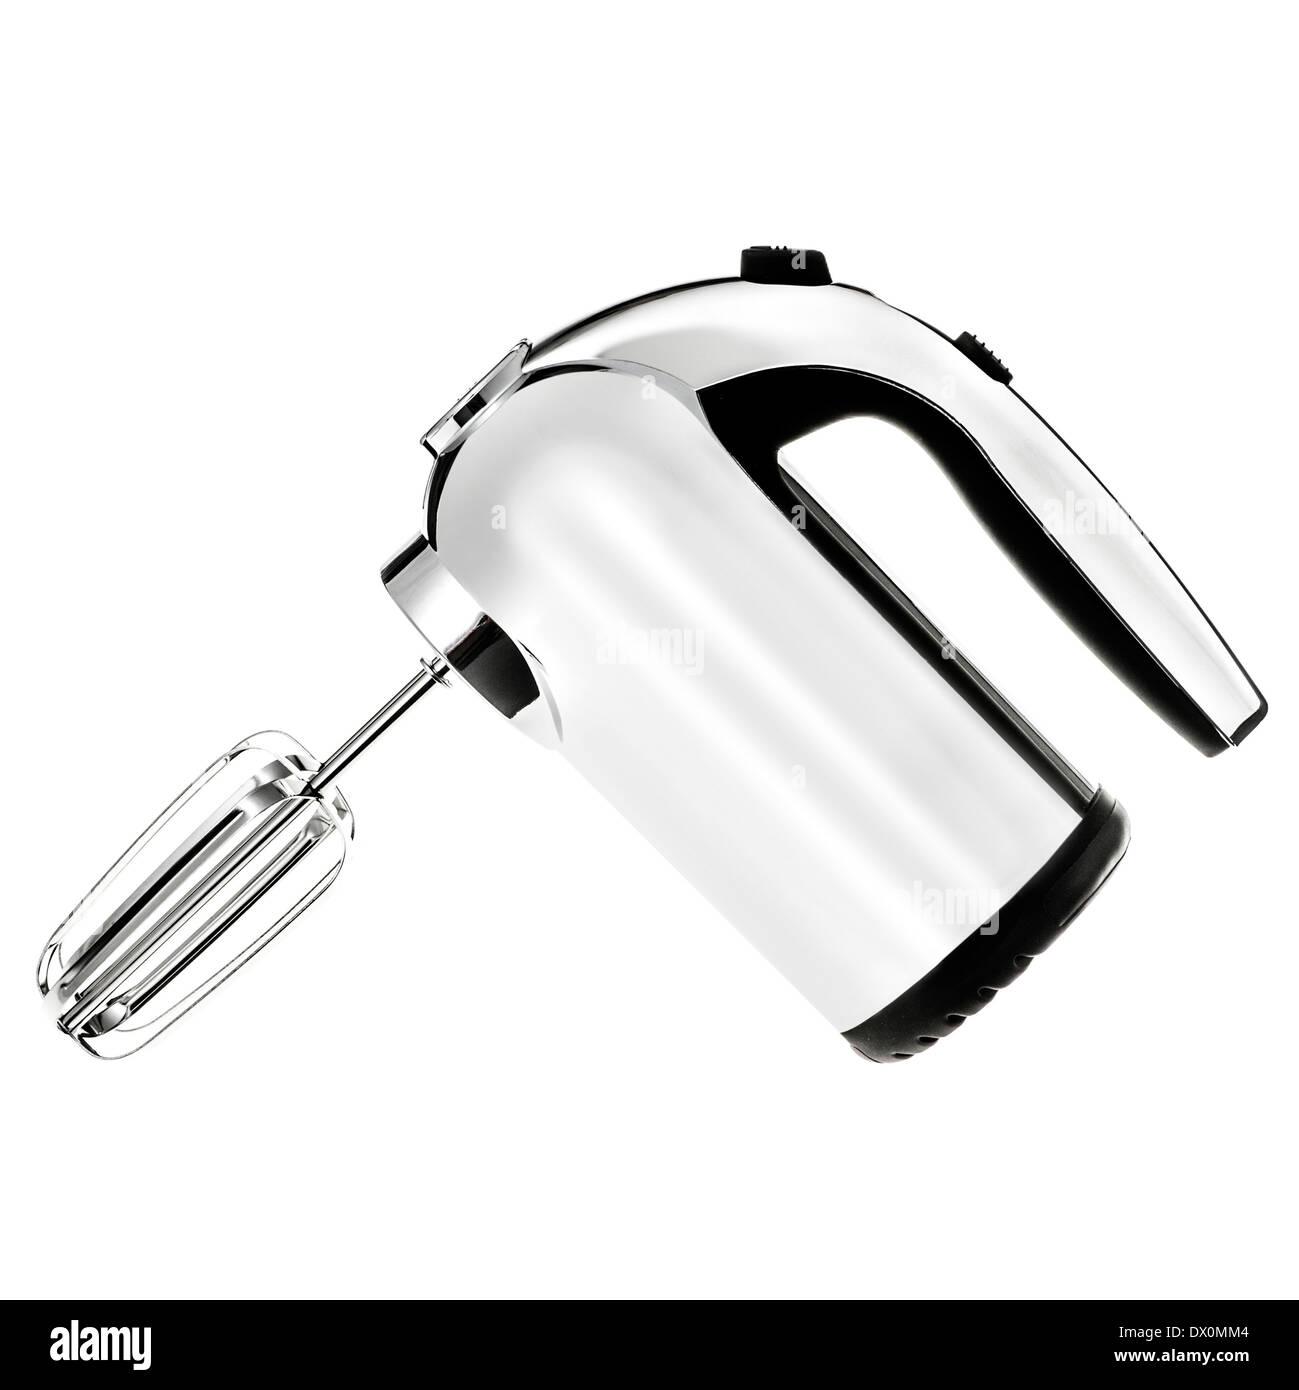 Modern shiny silver metallic electric hand mixer on white background - Stock Image